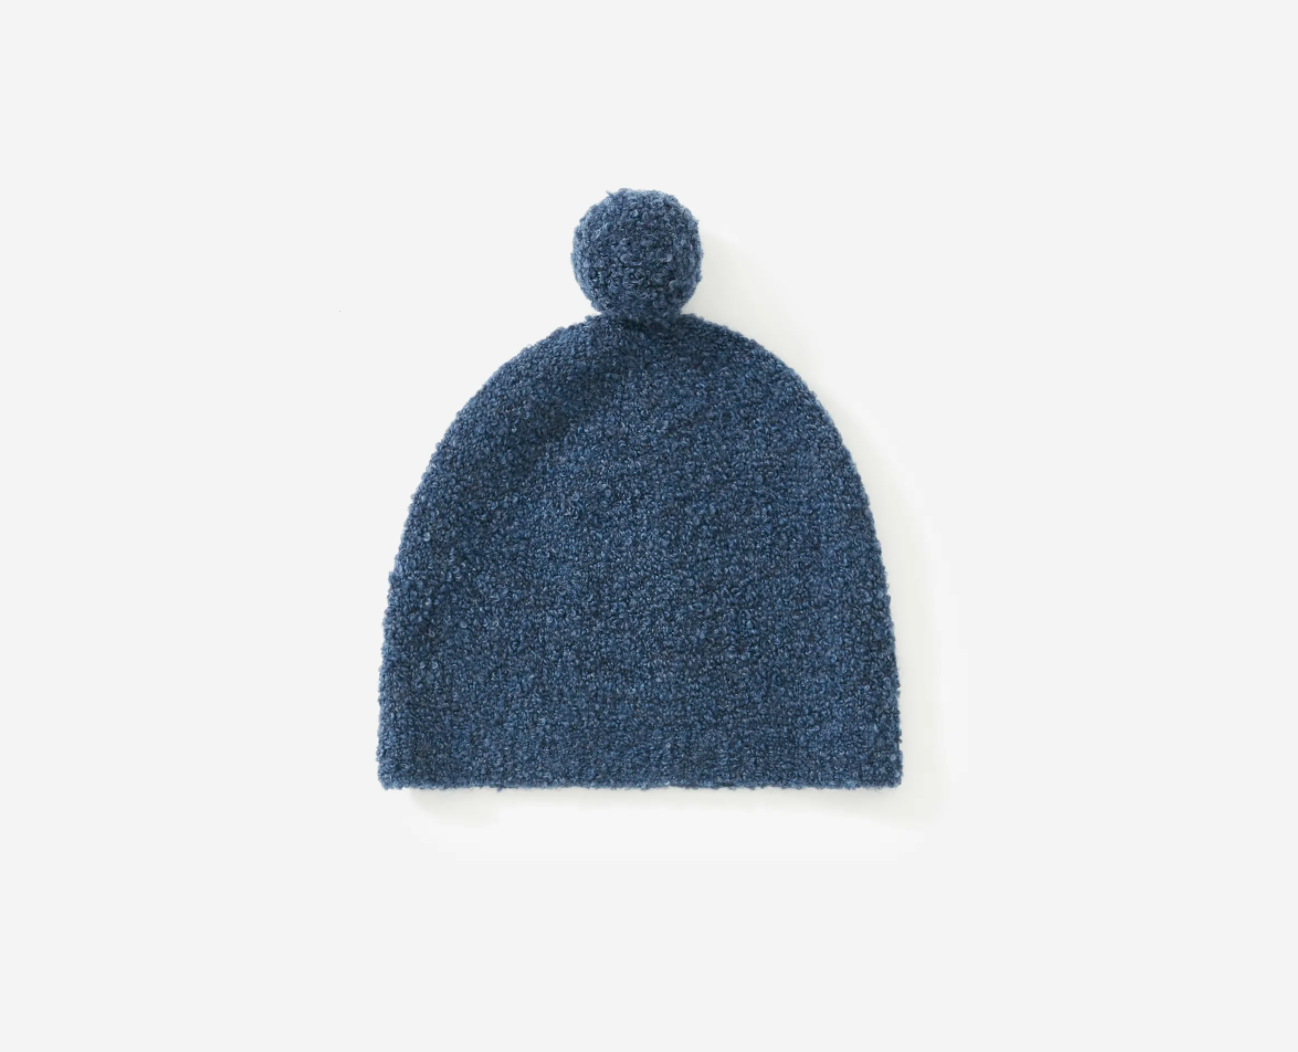 everlane winter hat, cute winter hats